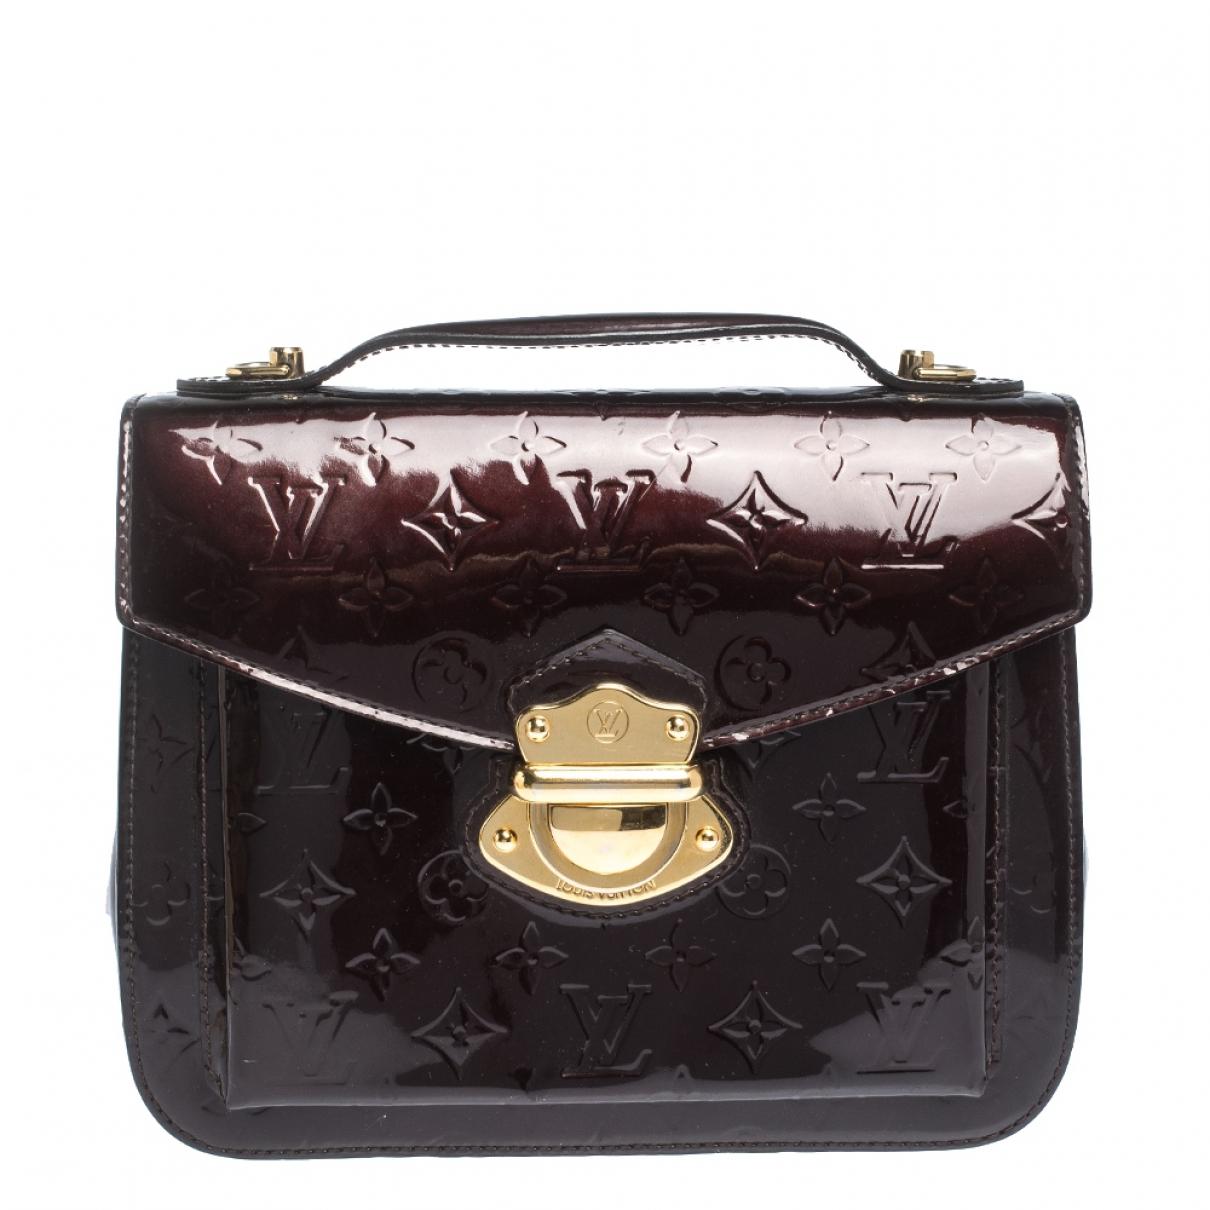 Louis Vuitton Mirada Patent leather handbag for Women N